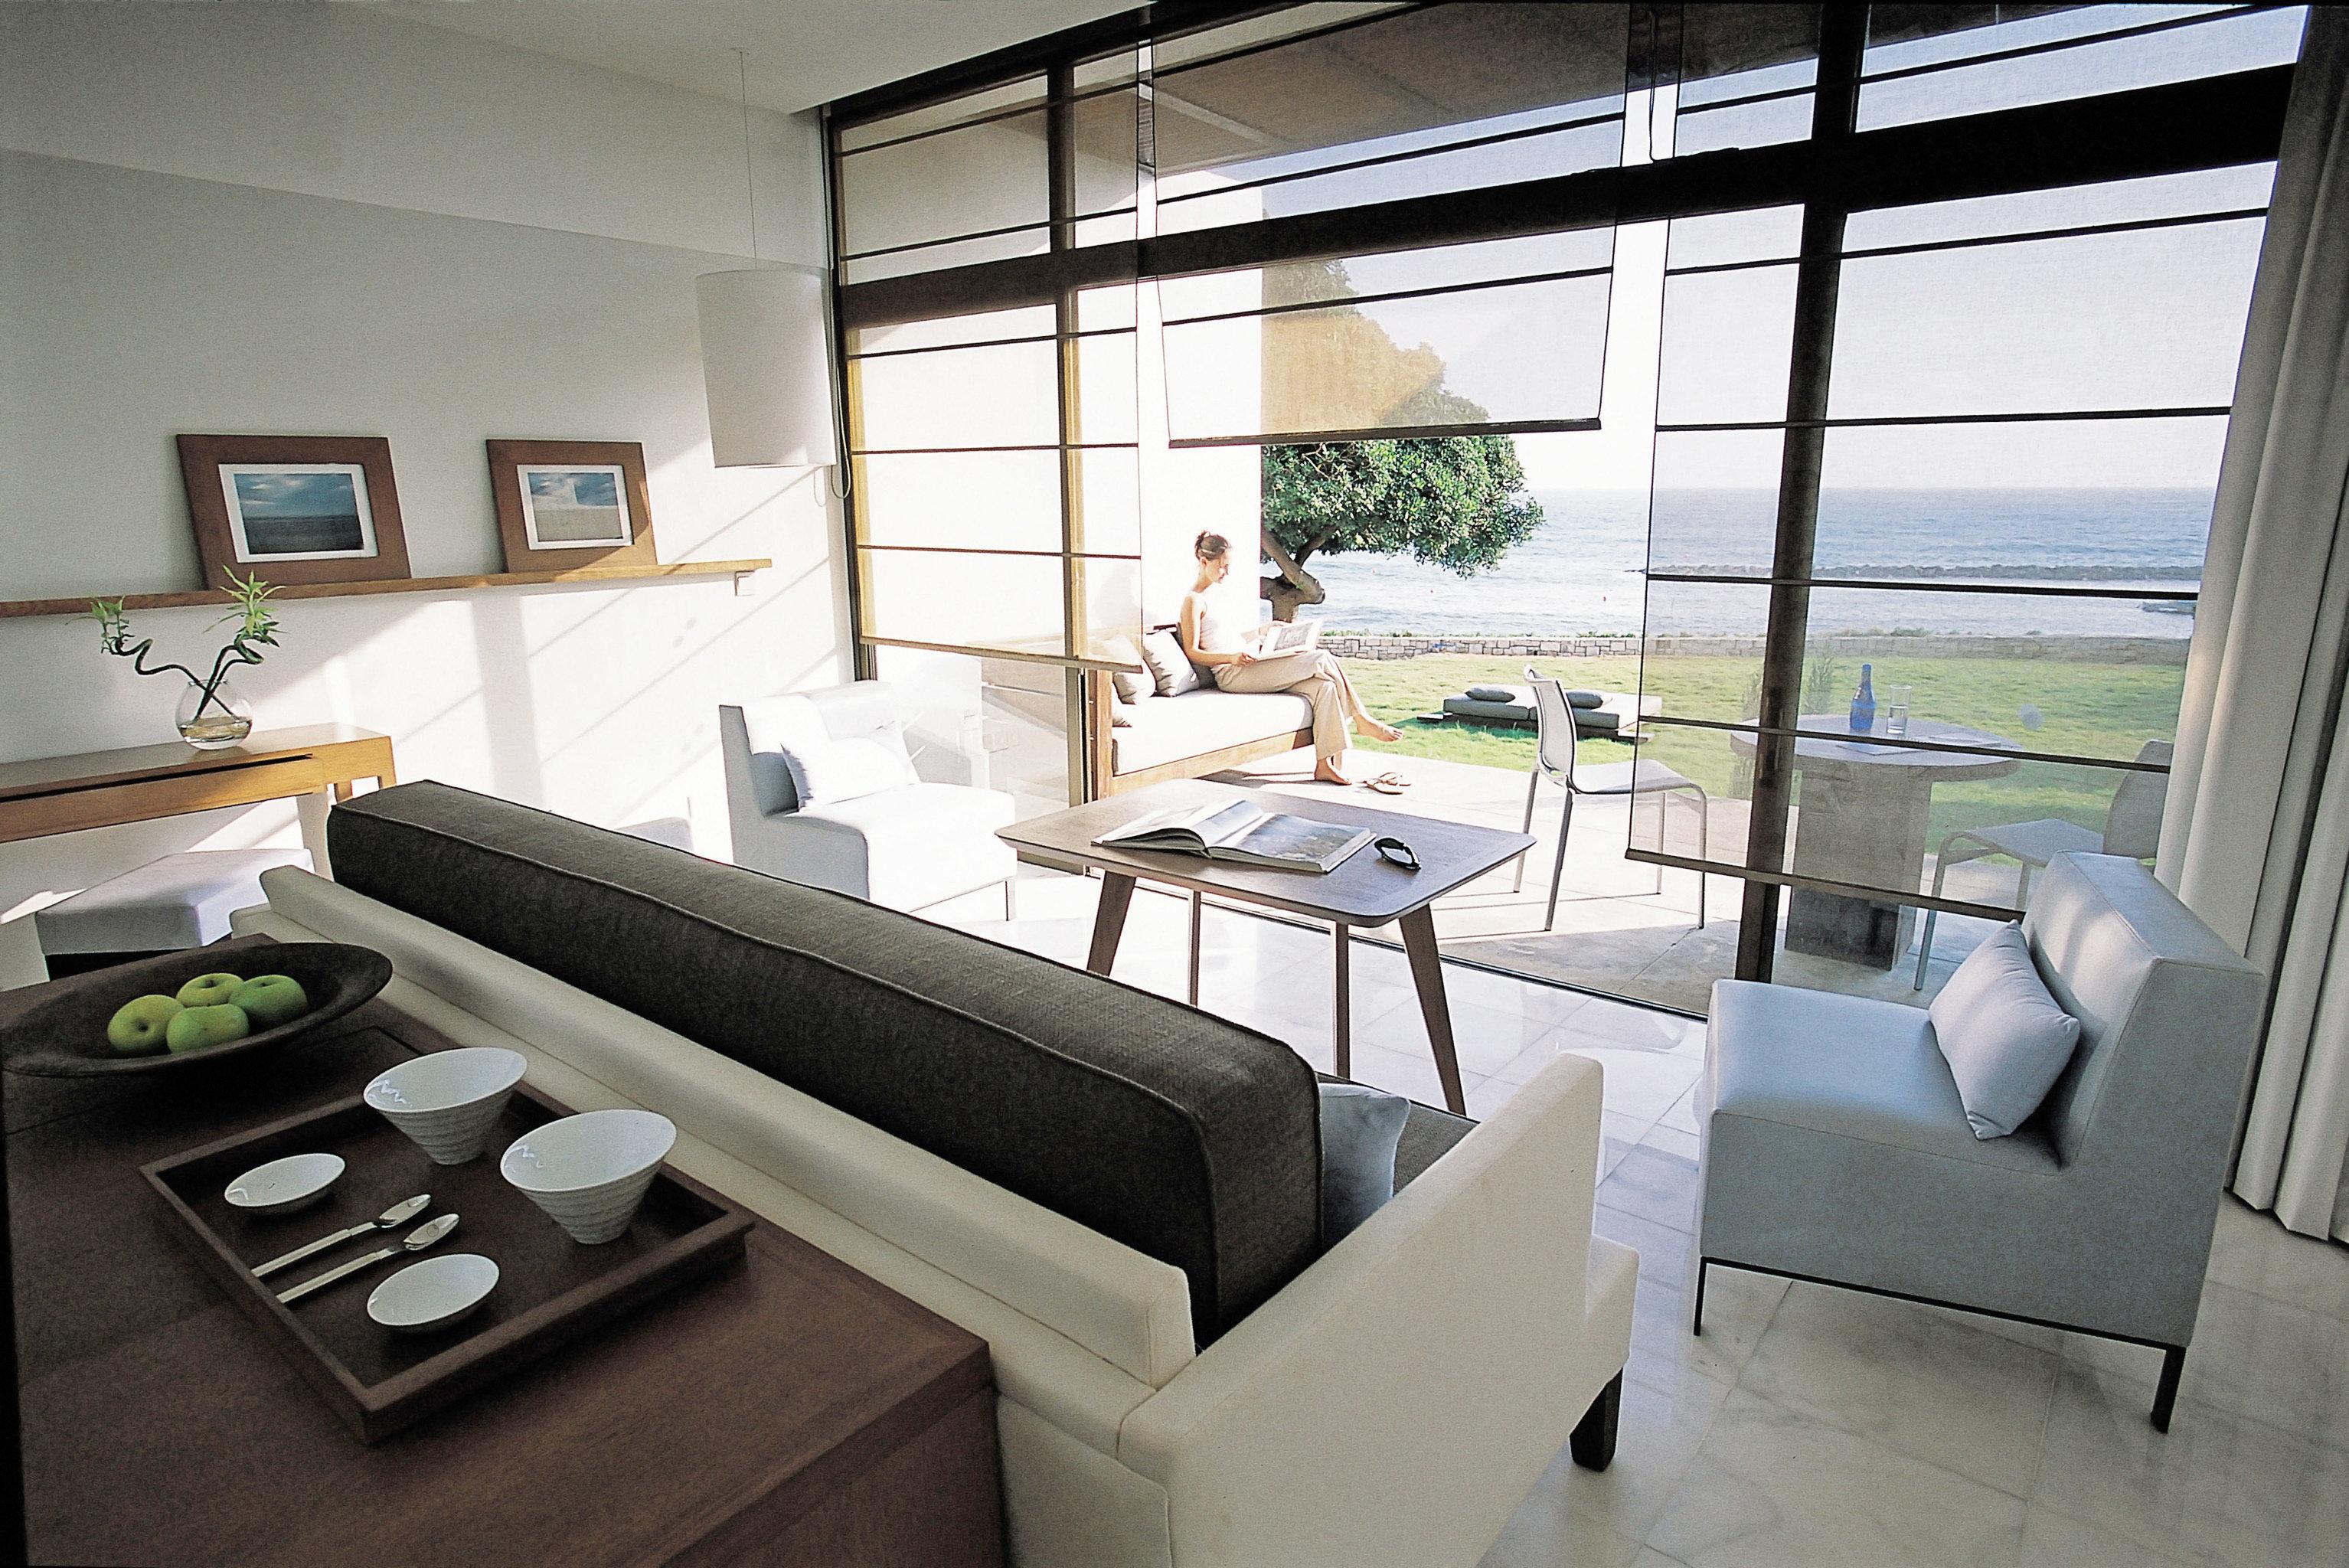 Elegant Family Island Lounge Patio Scenic views Suite Waterfront property condominium home living room cottage Villa